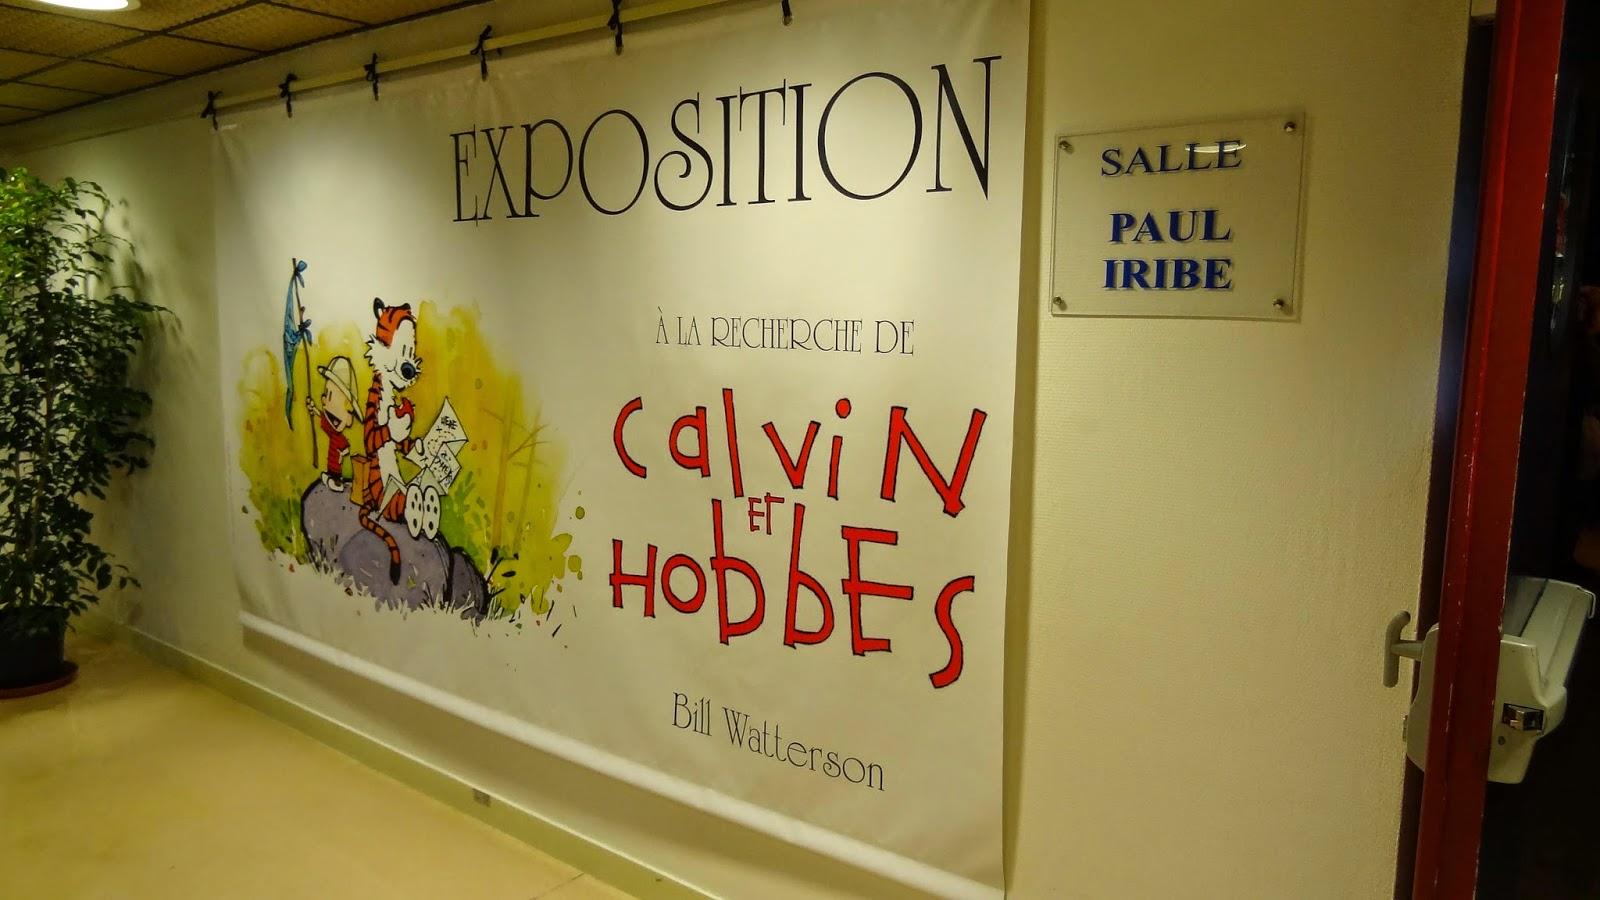 Expo Watterson Calvin et Hobbes, Angoulême FIBD 2015, Affiche